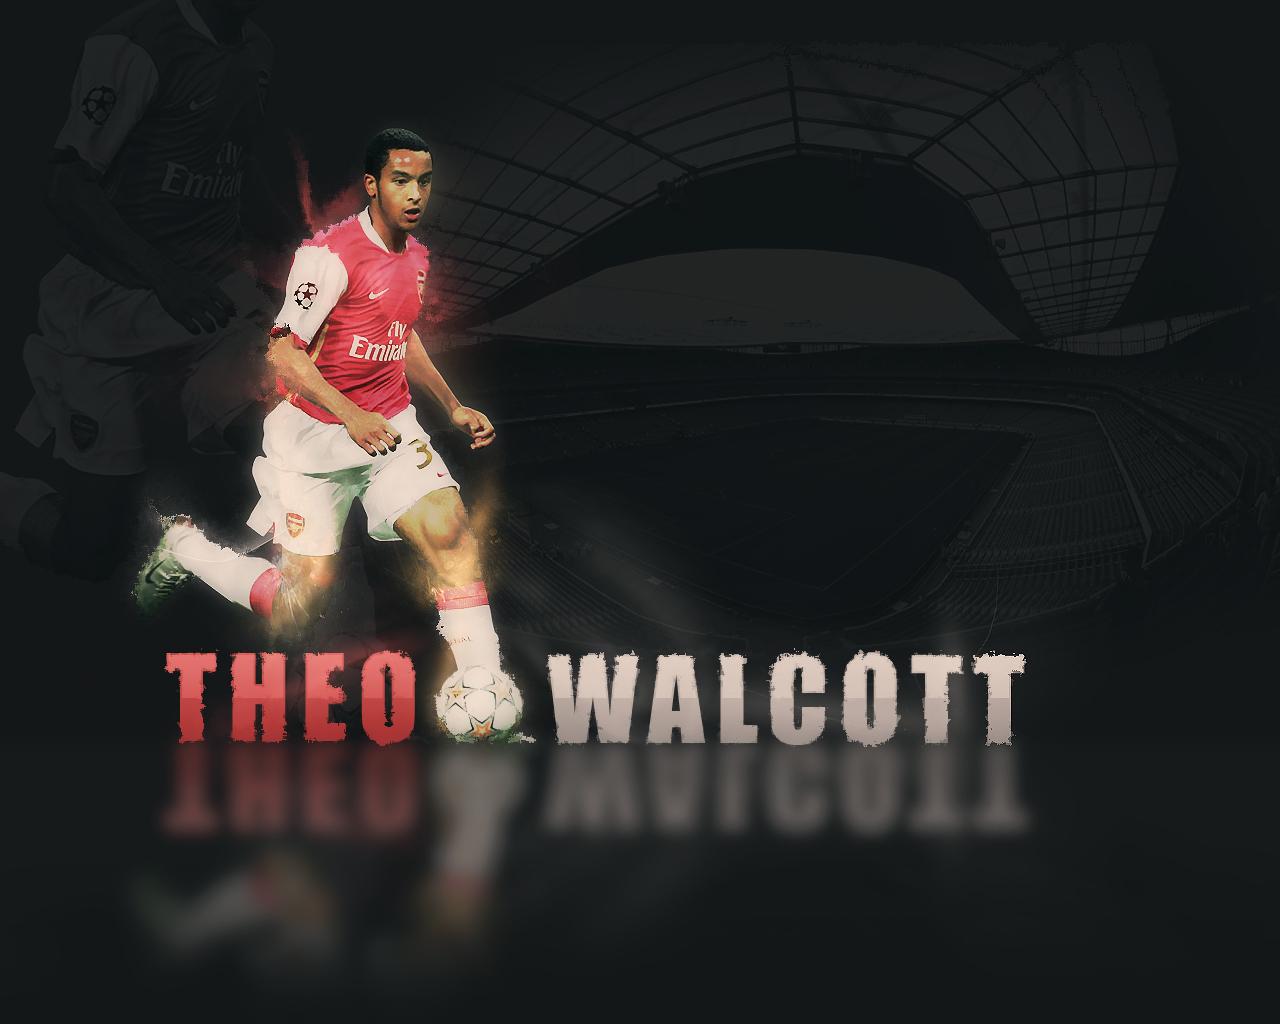 https://1.bp.blogspot.com/-UoiAX5Hbwuo/T84i1uDifzI/AAAAAAAACVM/9HyzuIua6y8/s1600/Theo-Walcott-2.jpg